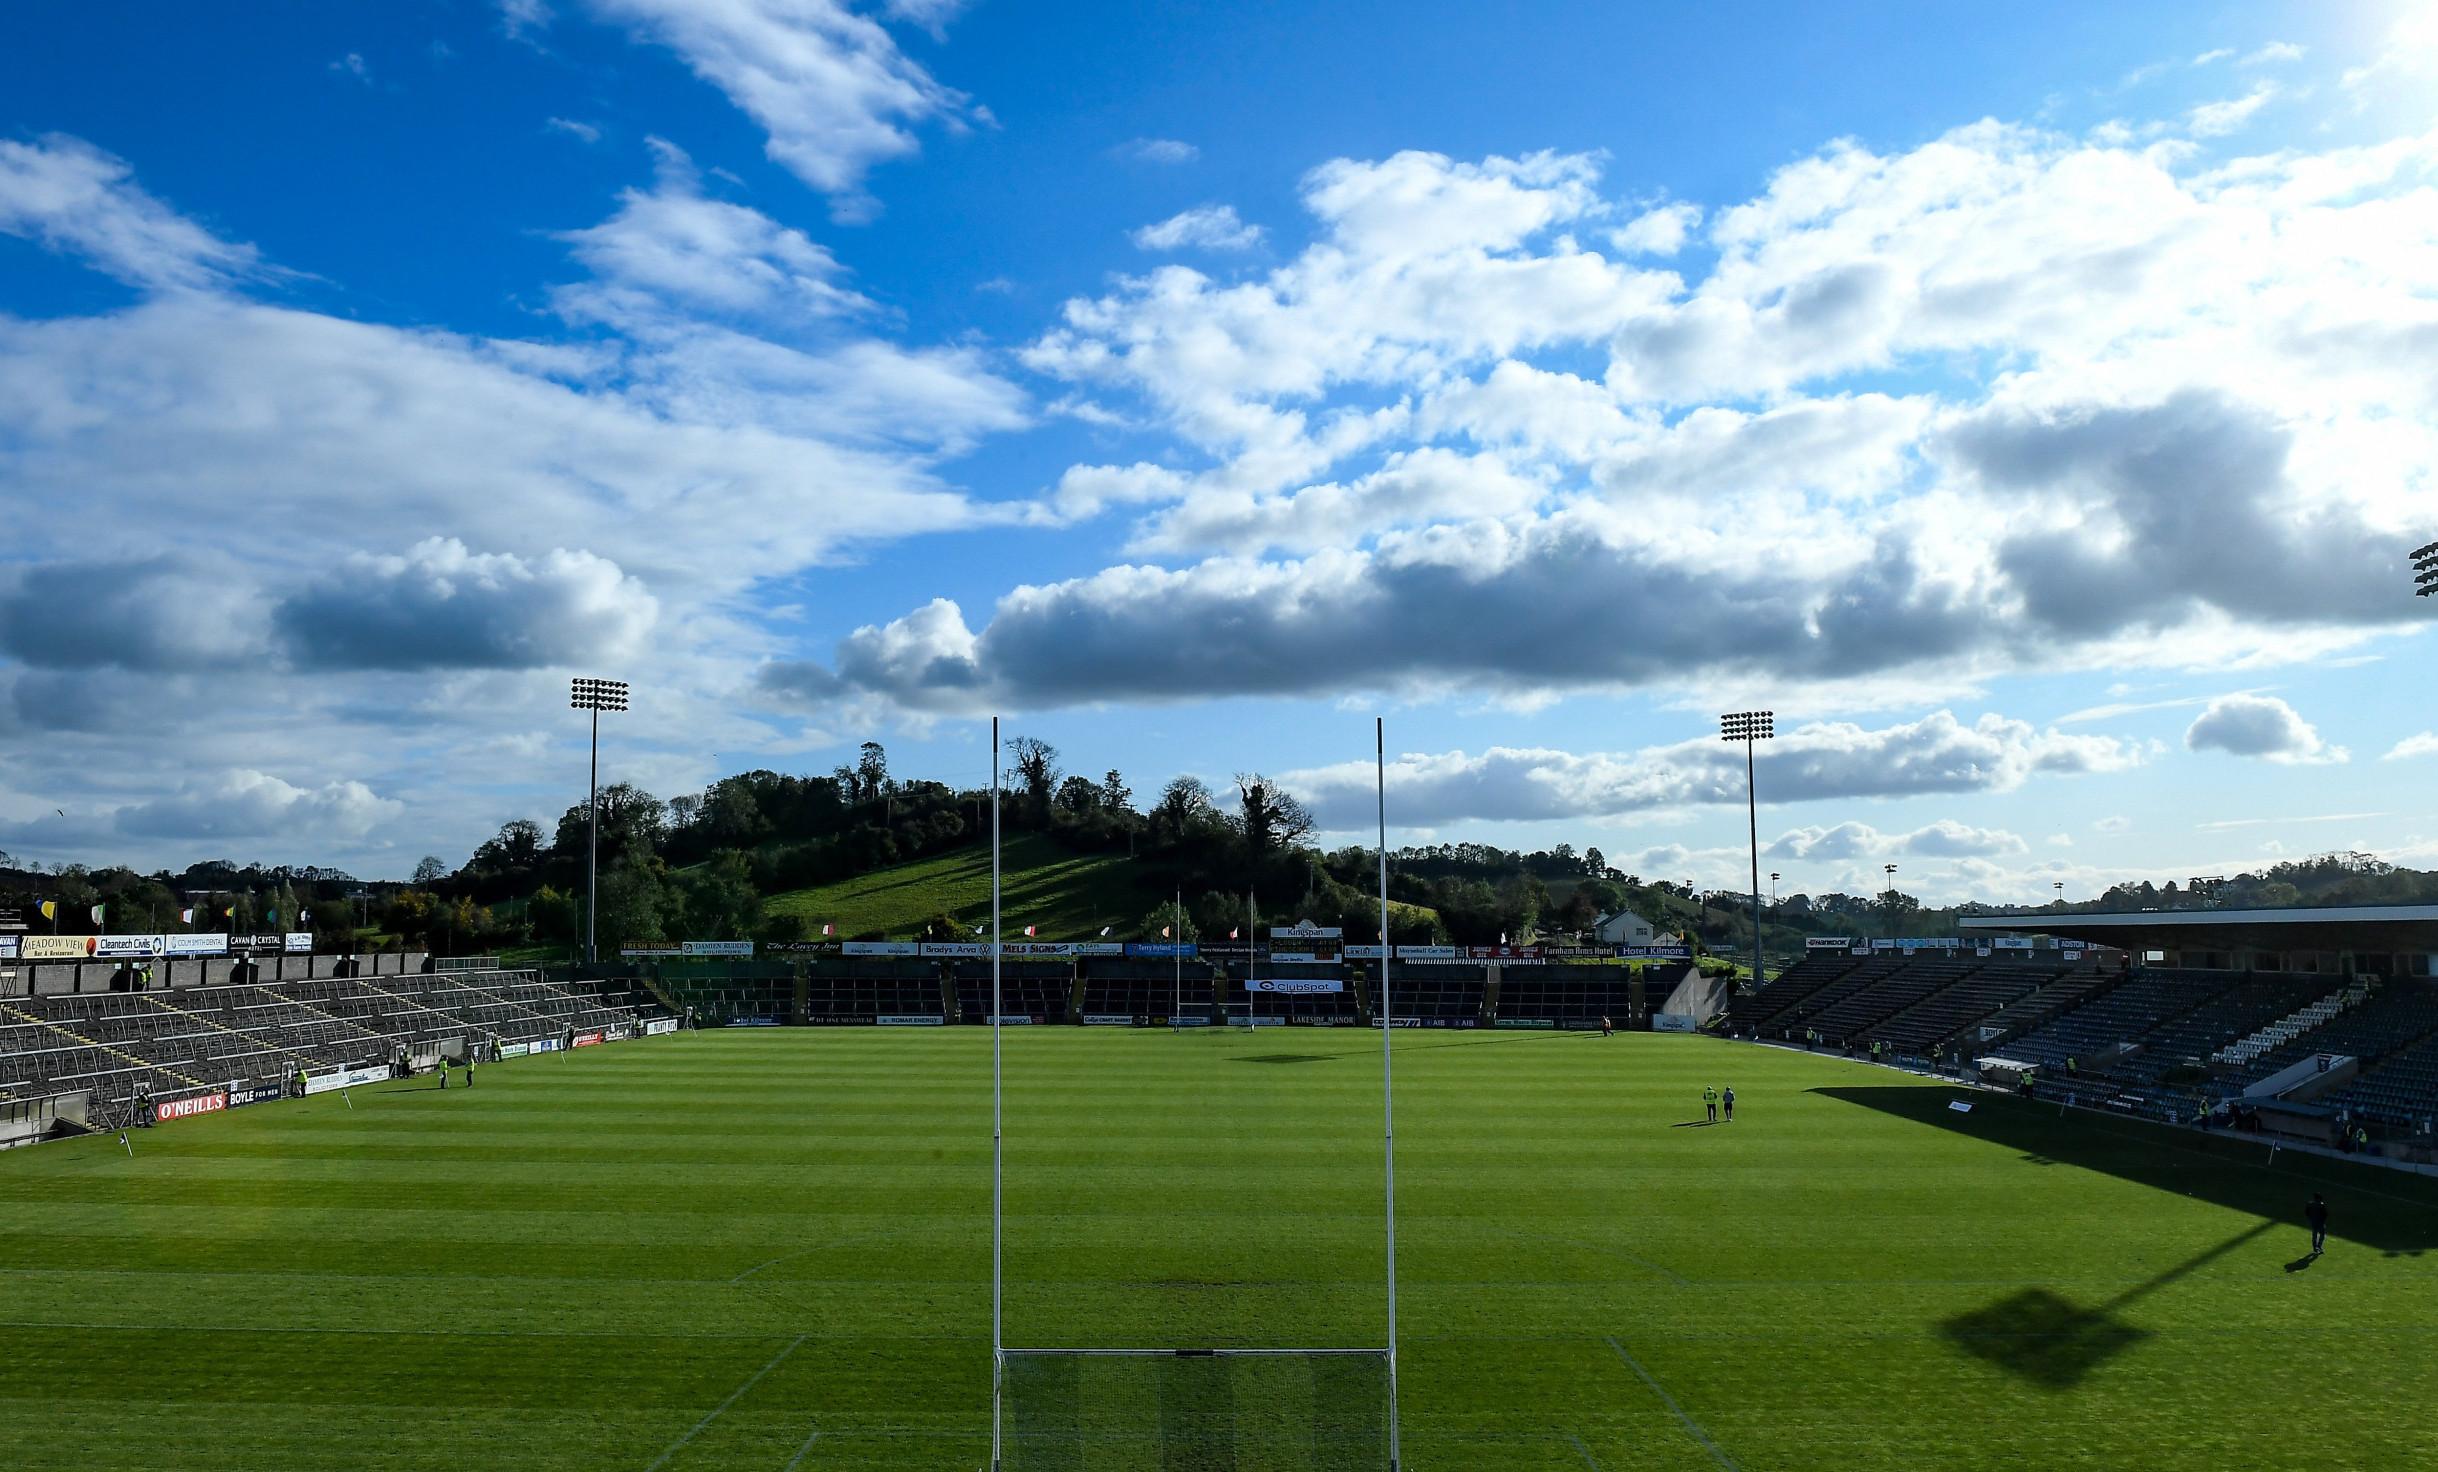 Venues confirmed for Ulster SFC Semi Finals